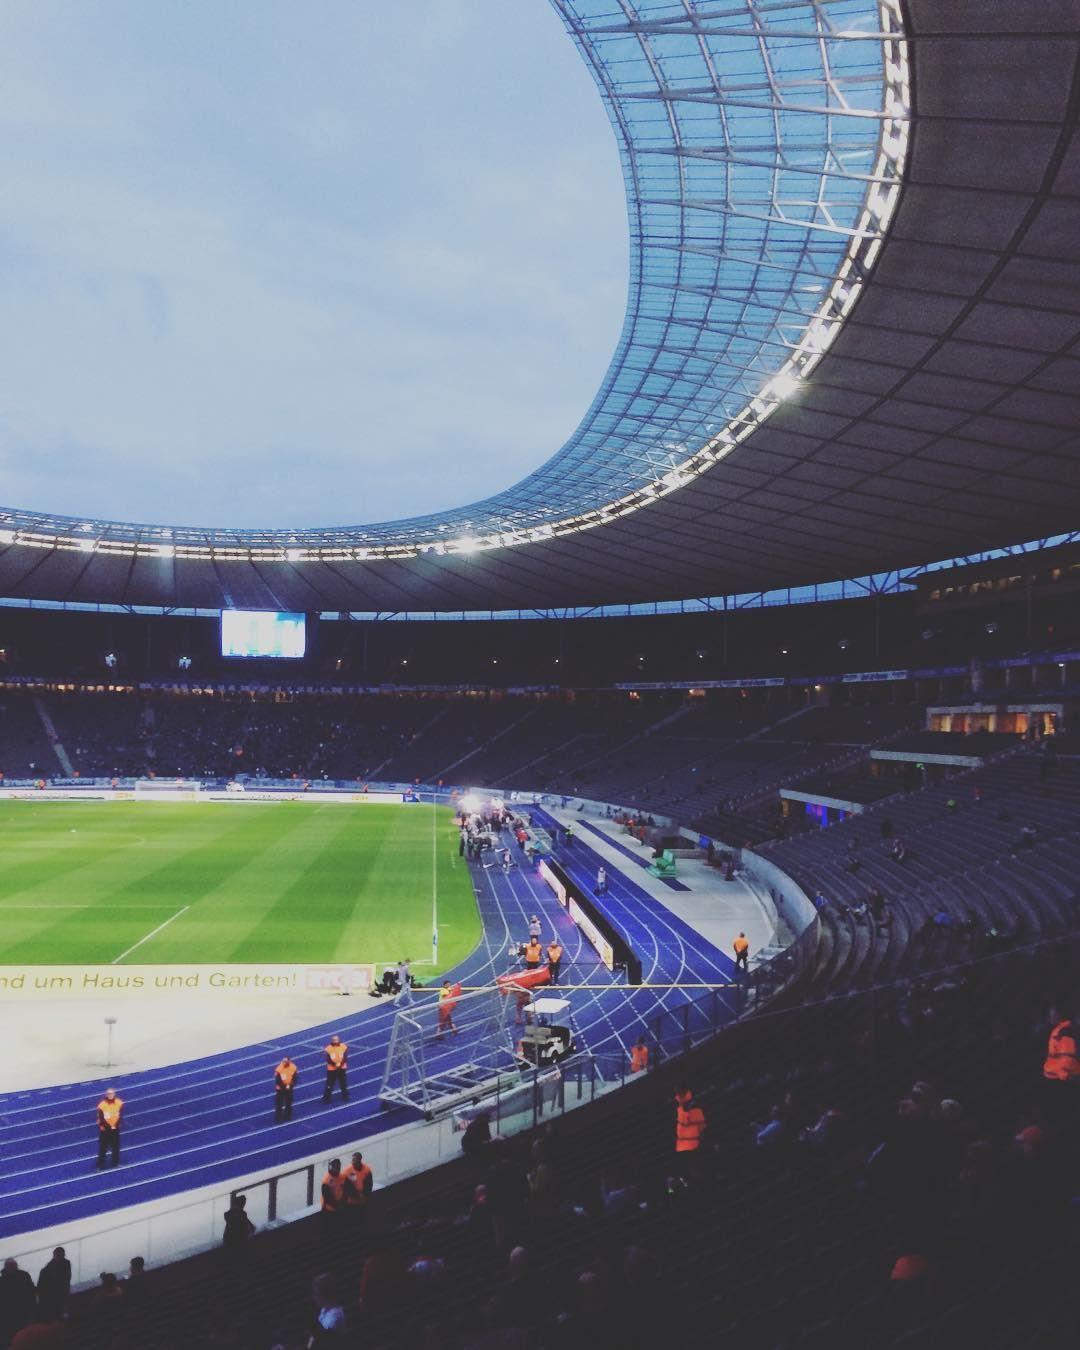 Watch The Best Youtube Videos Online Berlin Stadium Fans Stadion Berlin Olympiastadion Groundhopping Amazing Beautiful Ph Beautiful Stadium Berlin